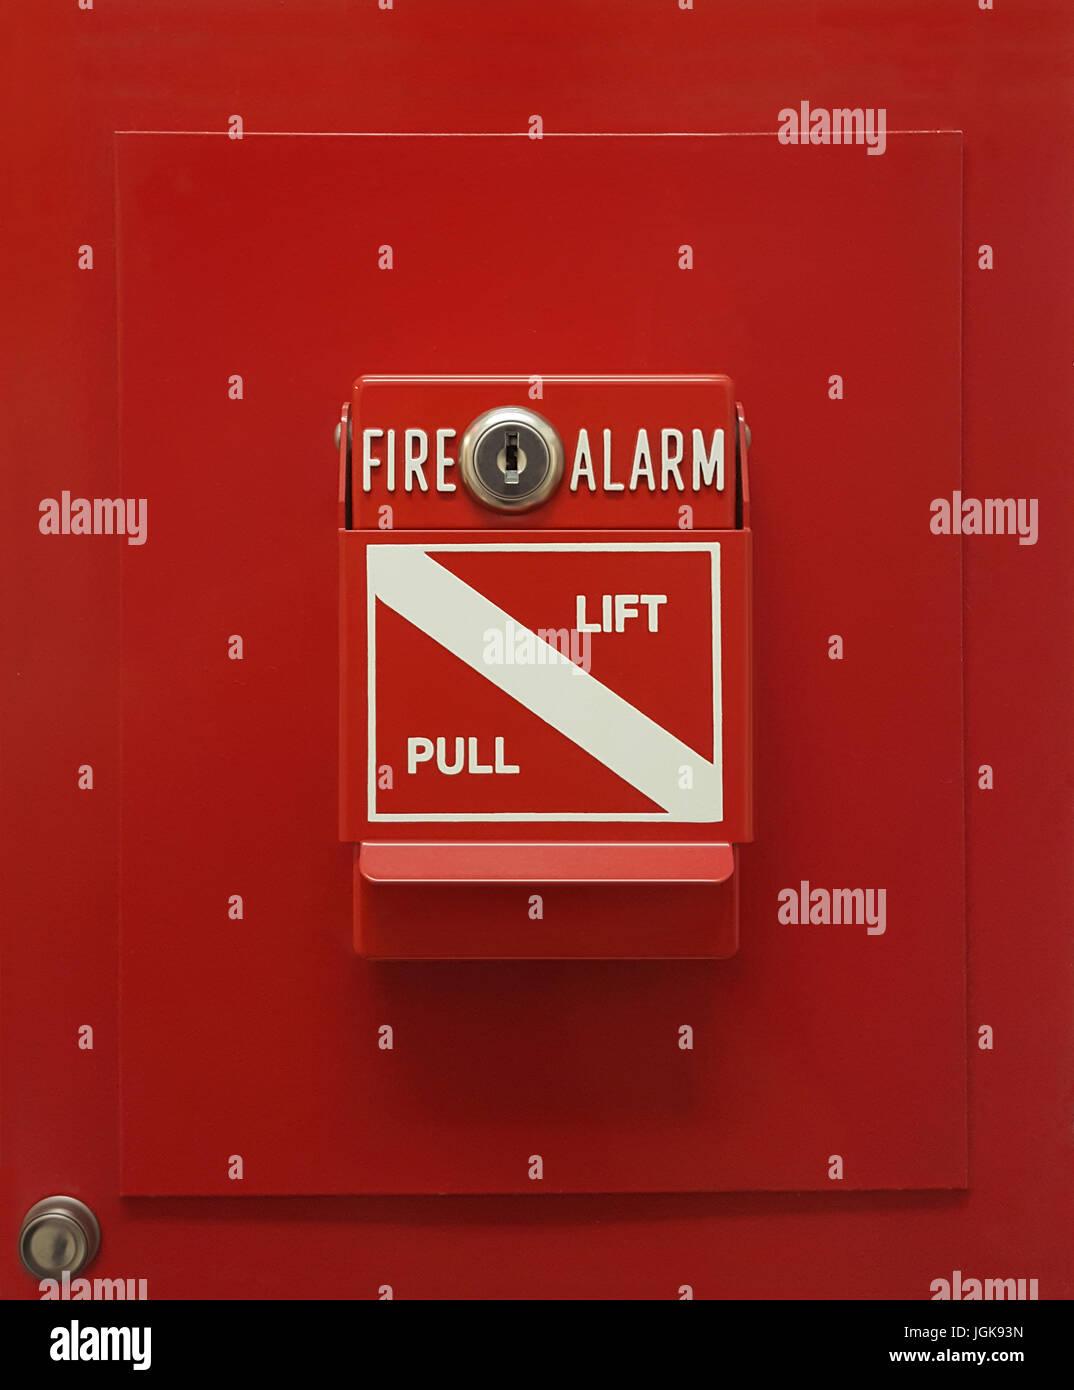 safty fire alarm lift pull box manual fire alarm activation pull